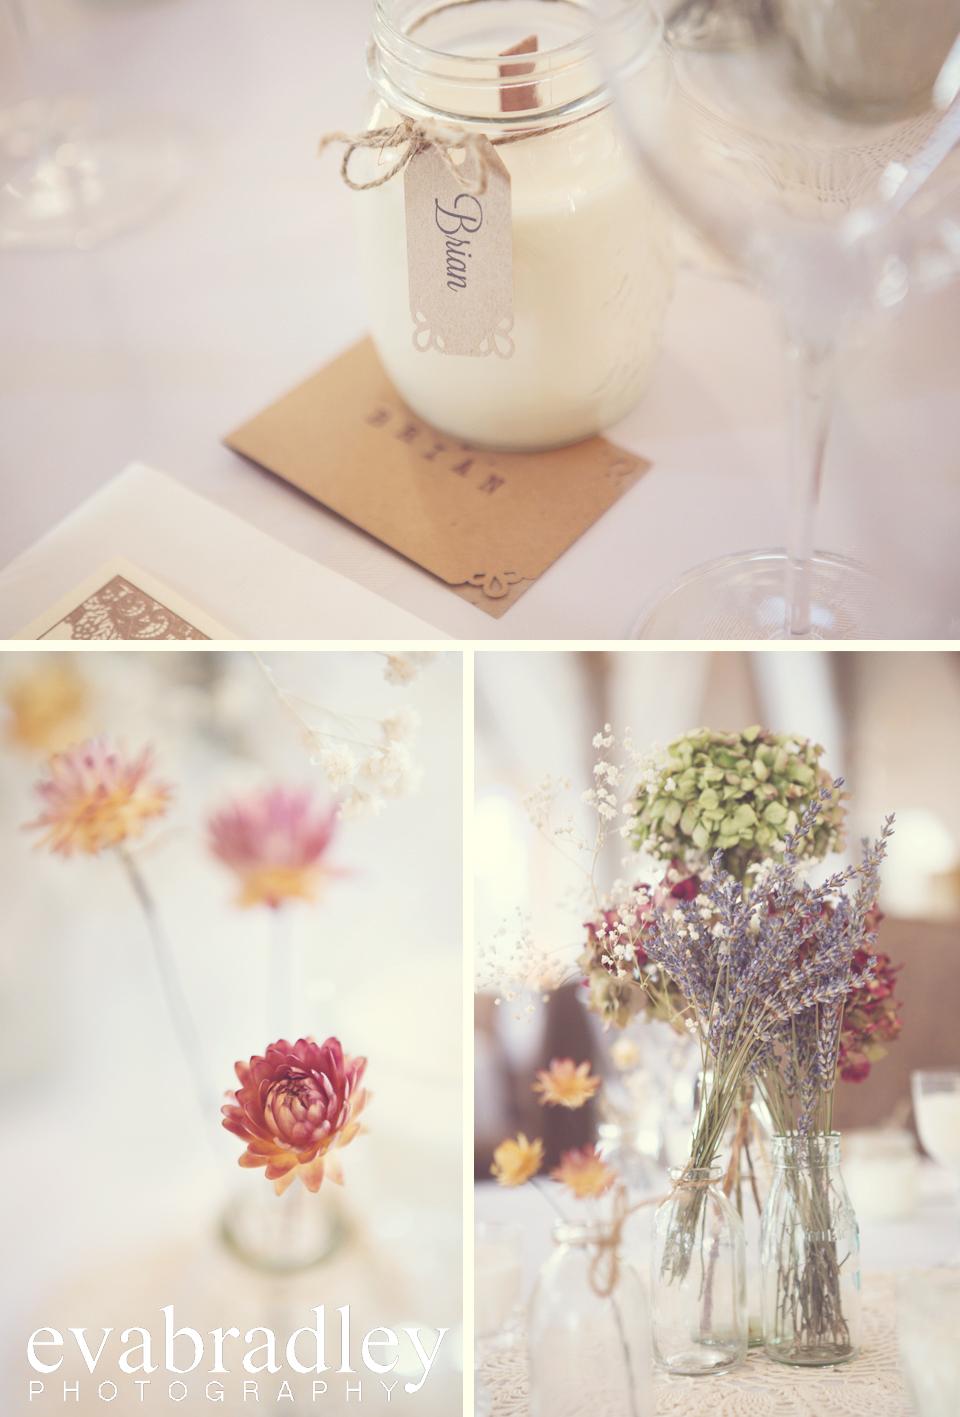 The-Old-Church-wedding-venues-Eva-Bradley (8)